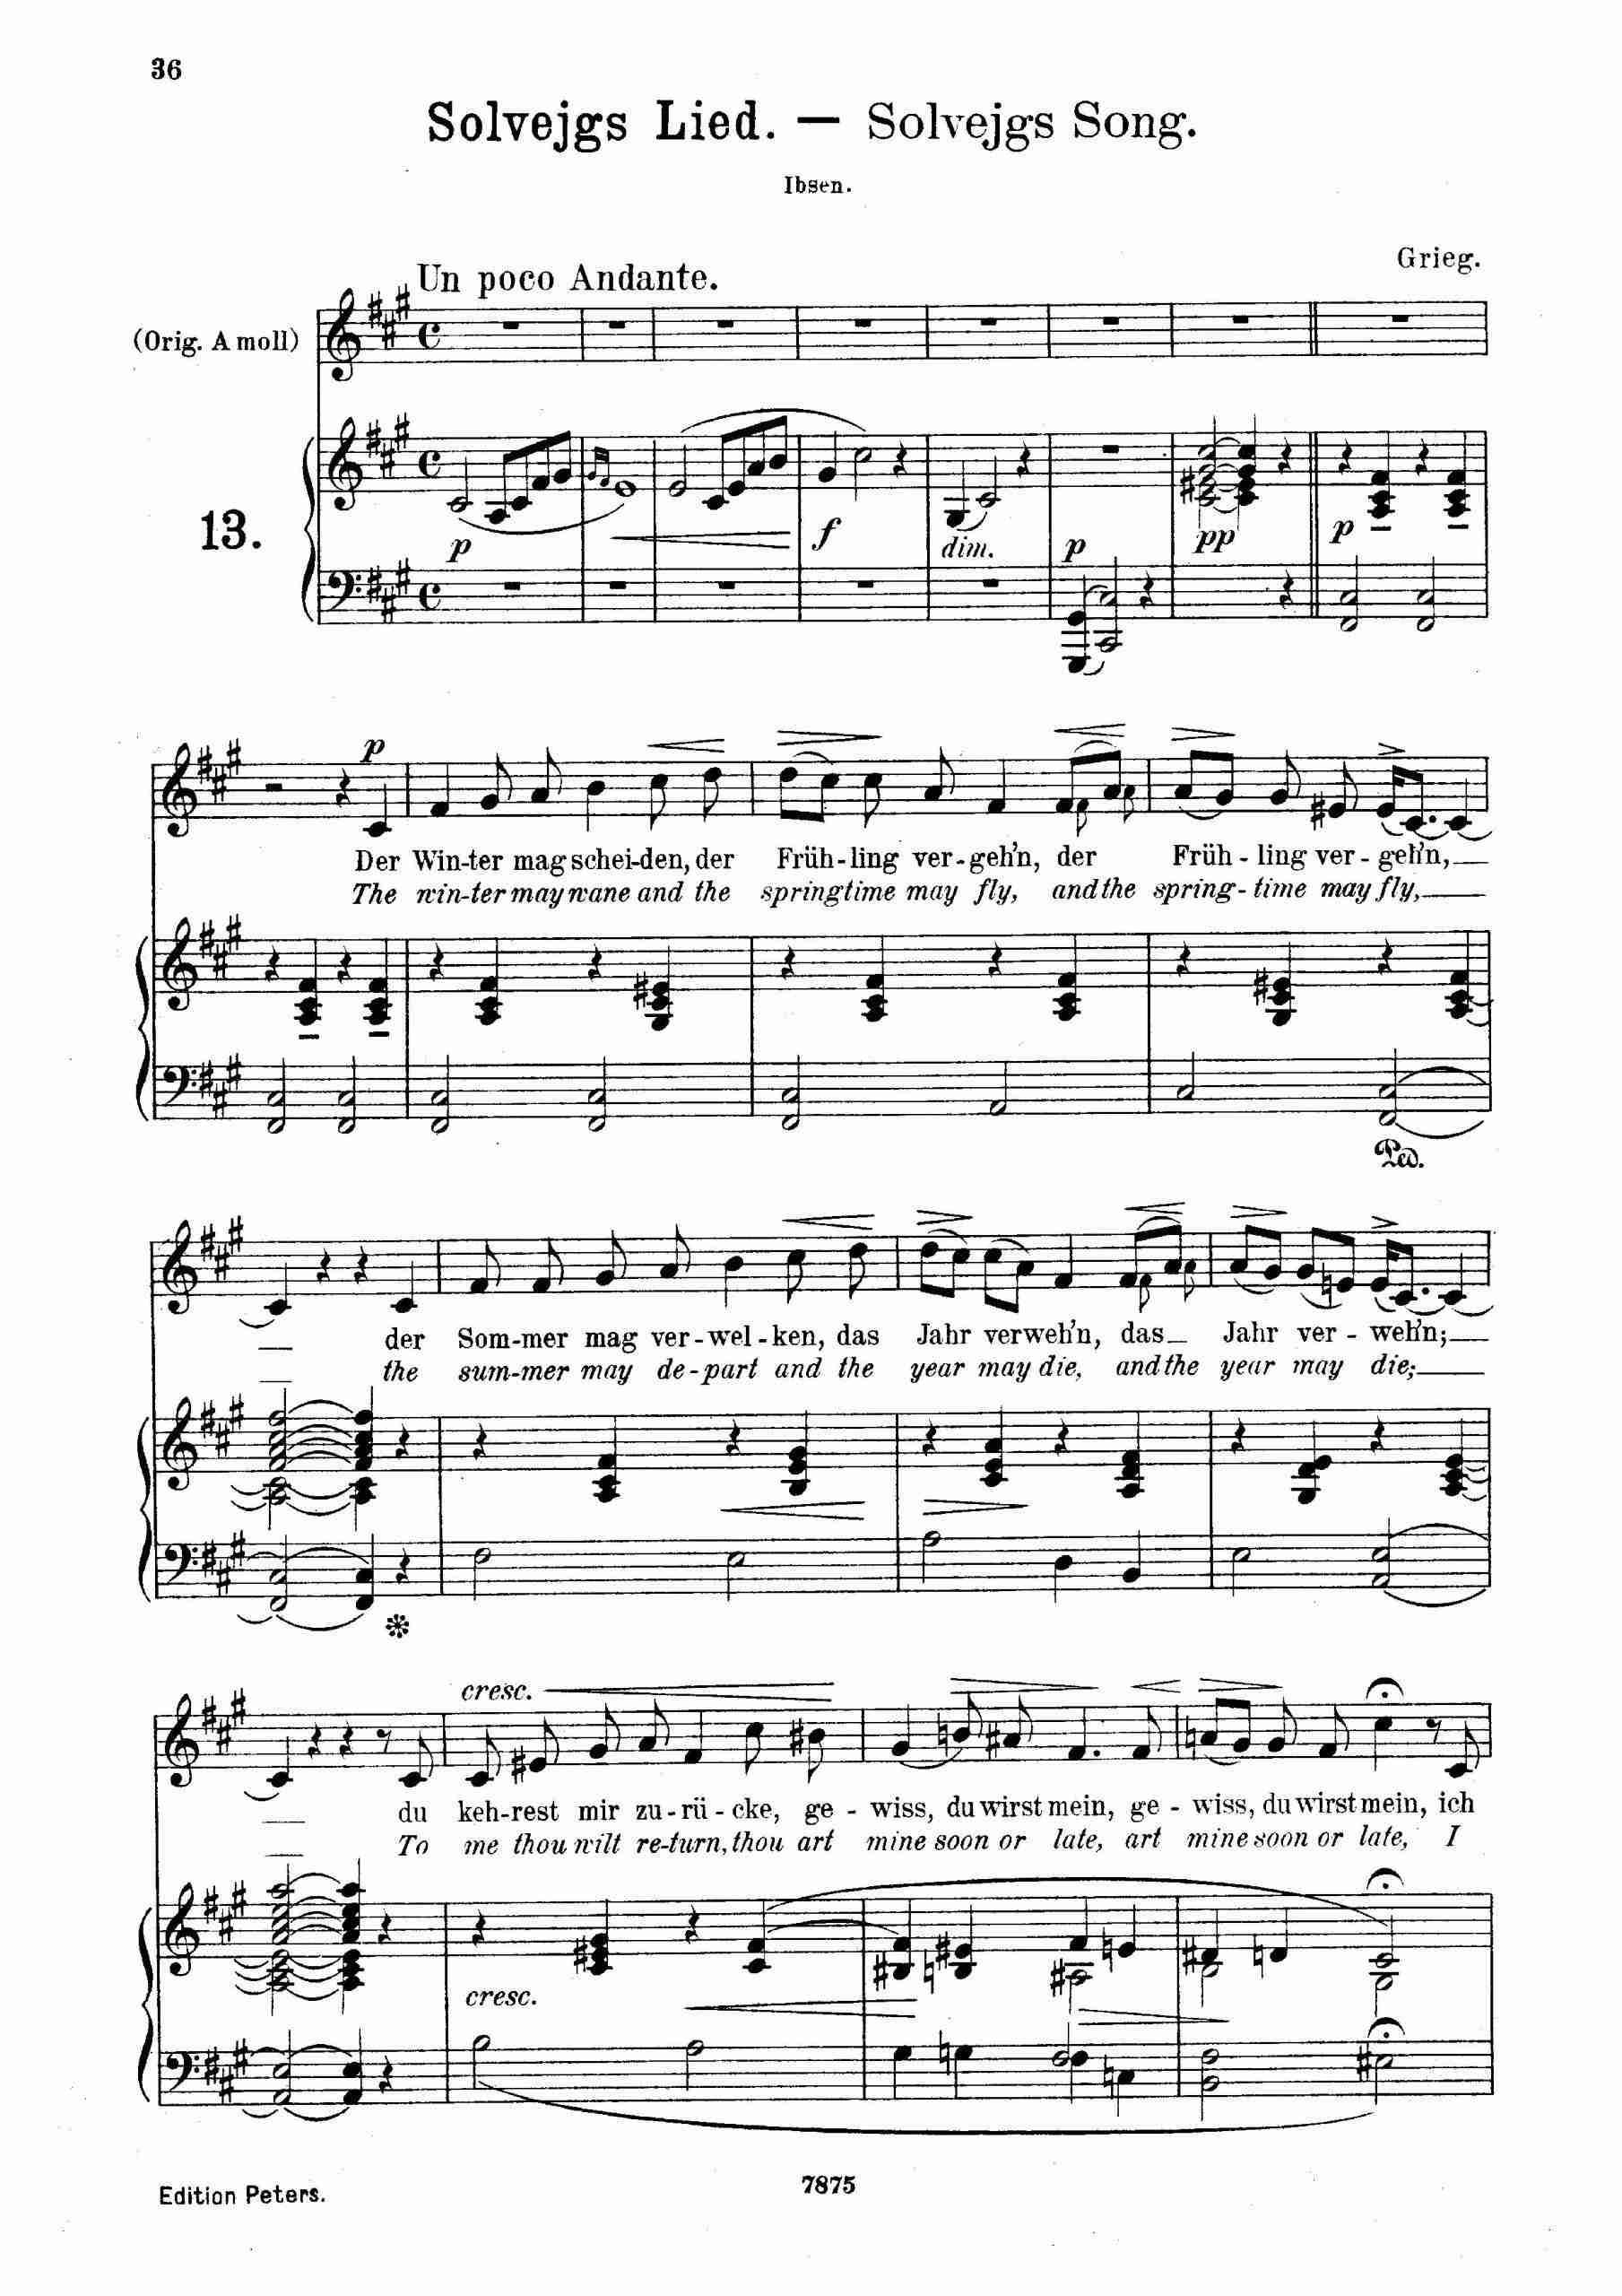 Grieg, Edvard - Peer Gynt, Op.23 (Solveig's song)